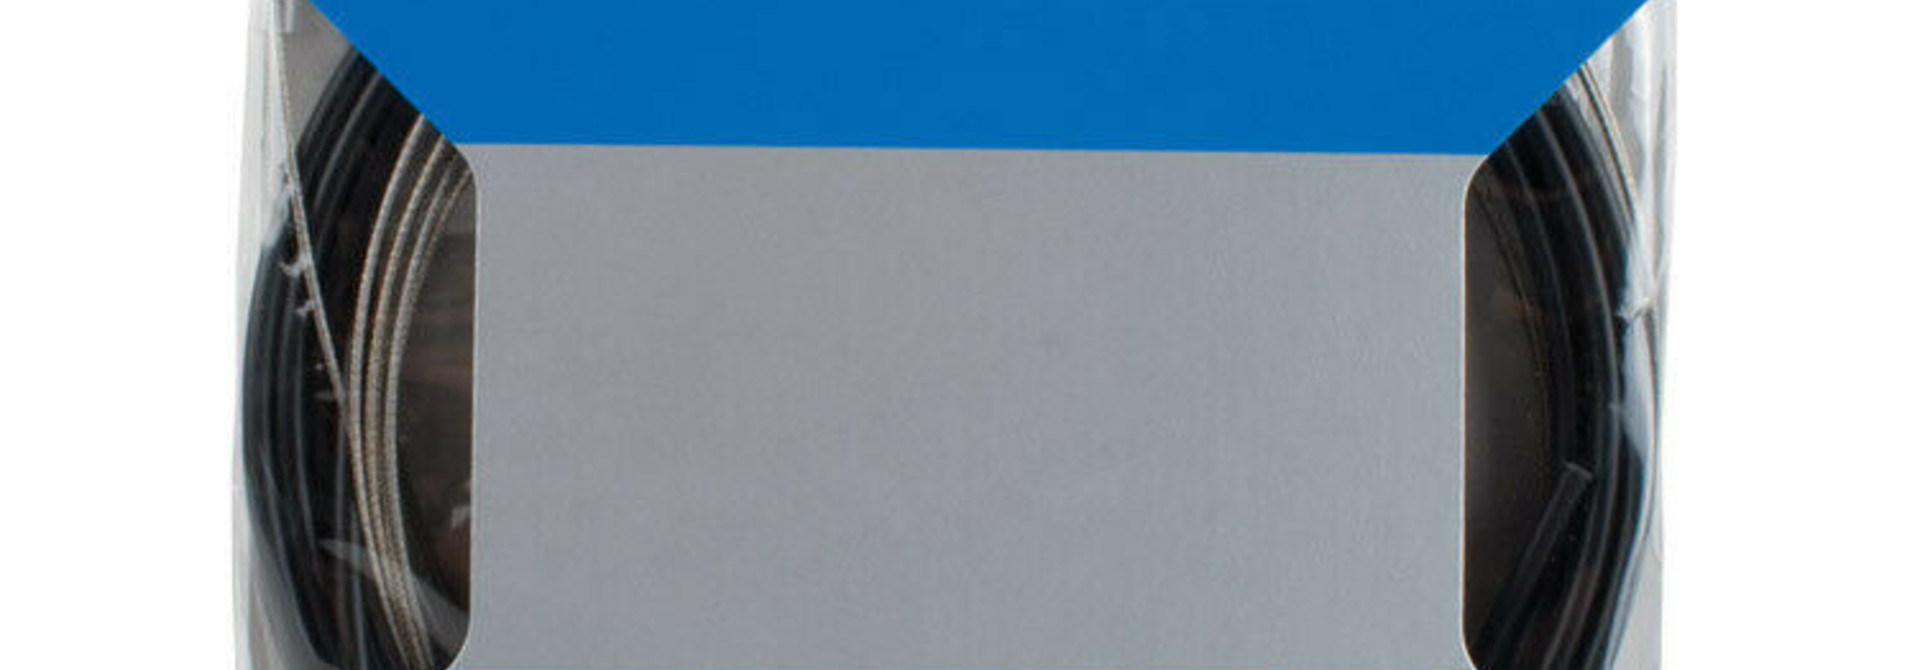 Shimano MTB SUS Shift Cable Set Black